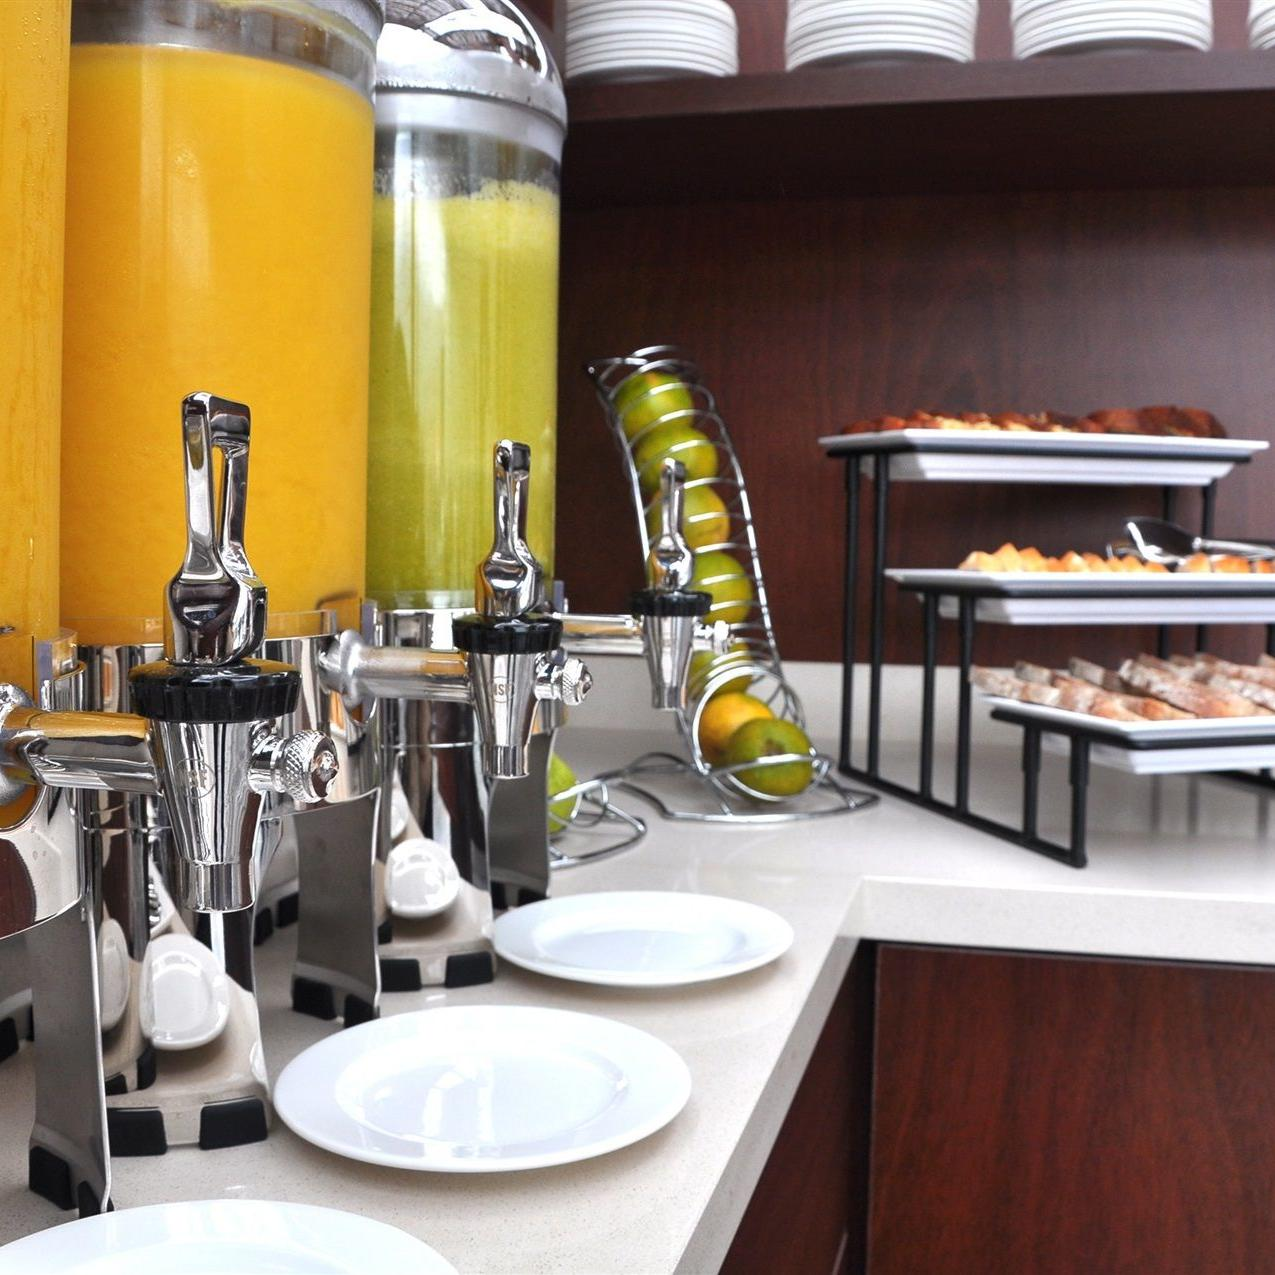 Desayuno Buffet Hotel TRYP Usaquén